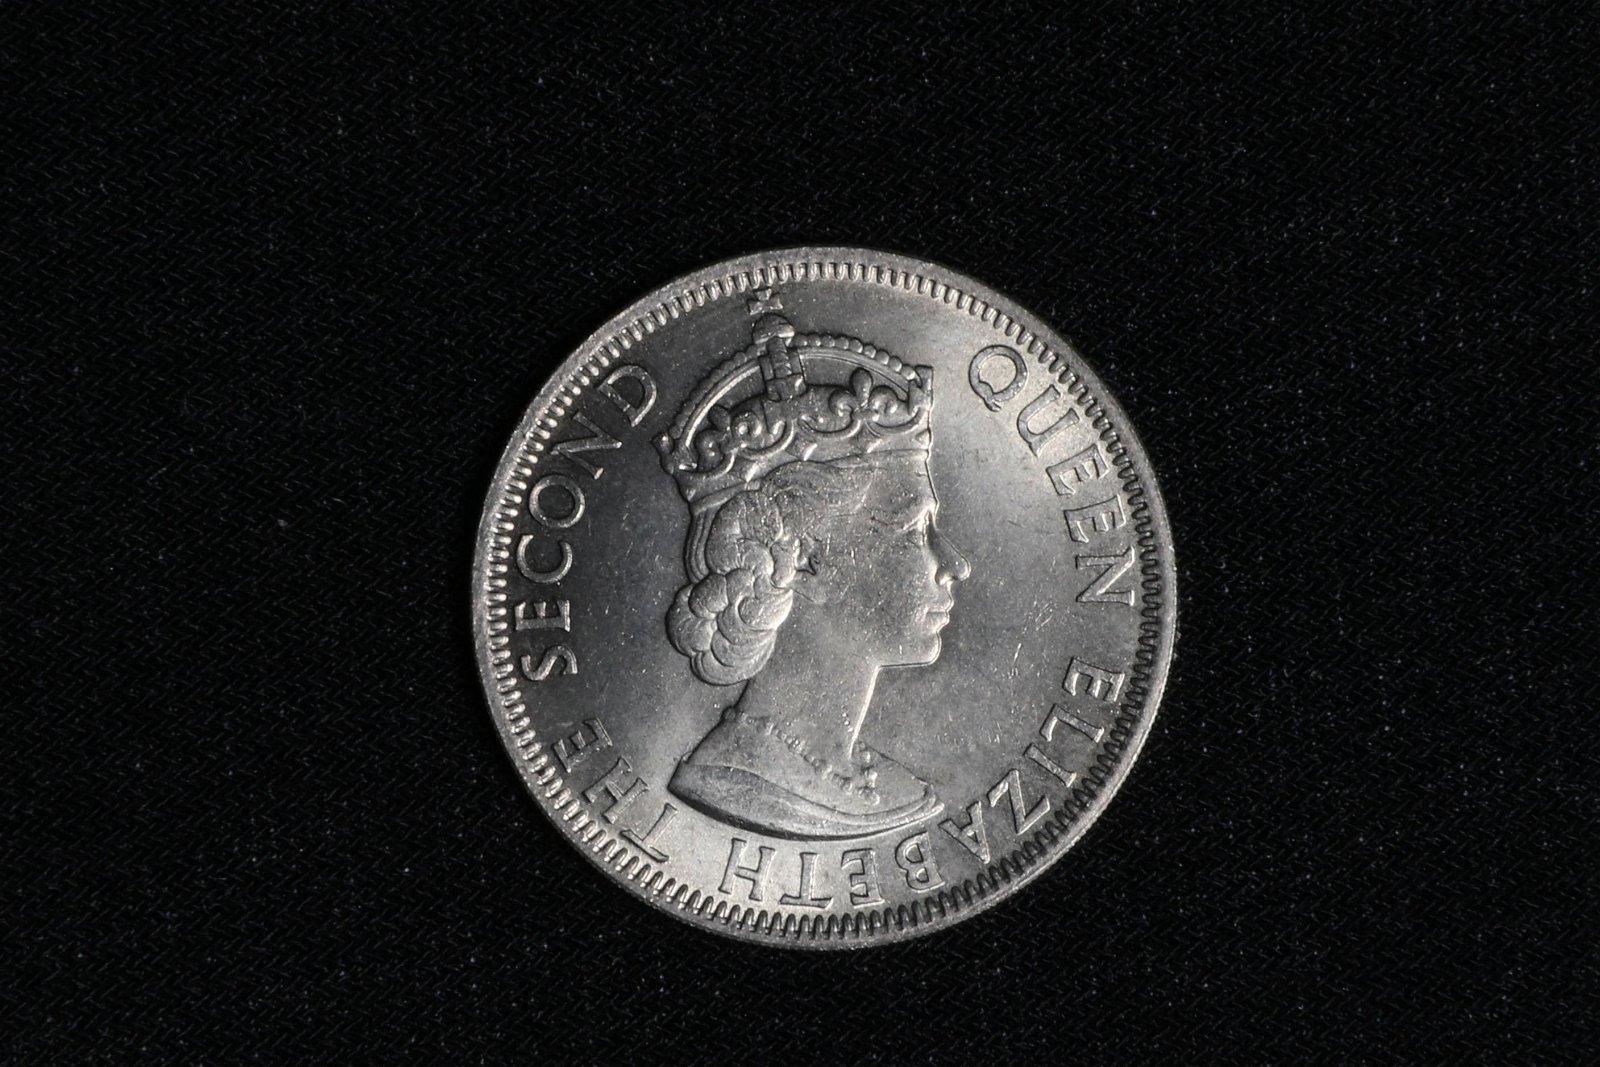 MALAYA AND BRITISH BORNEO 50 CENT COIN, 1961